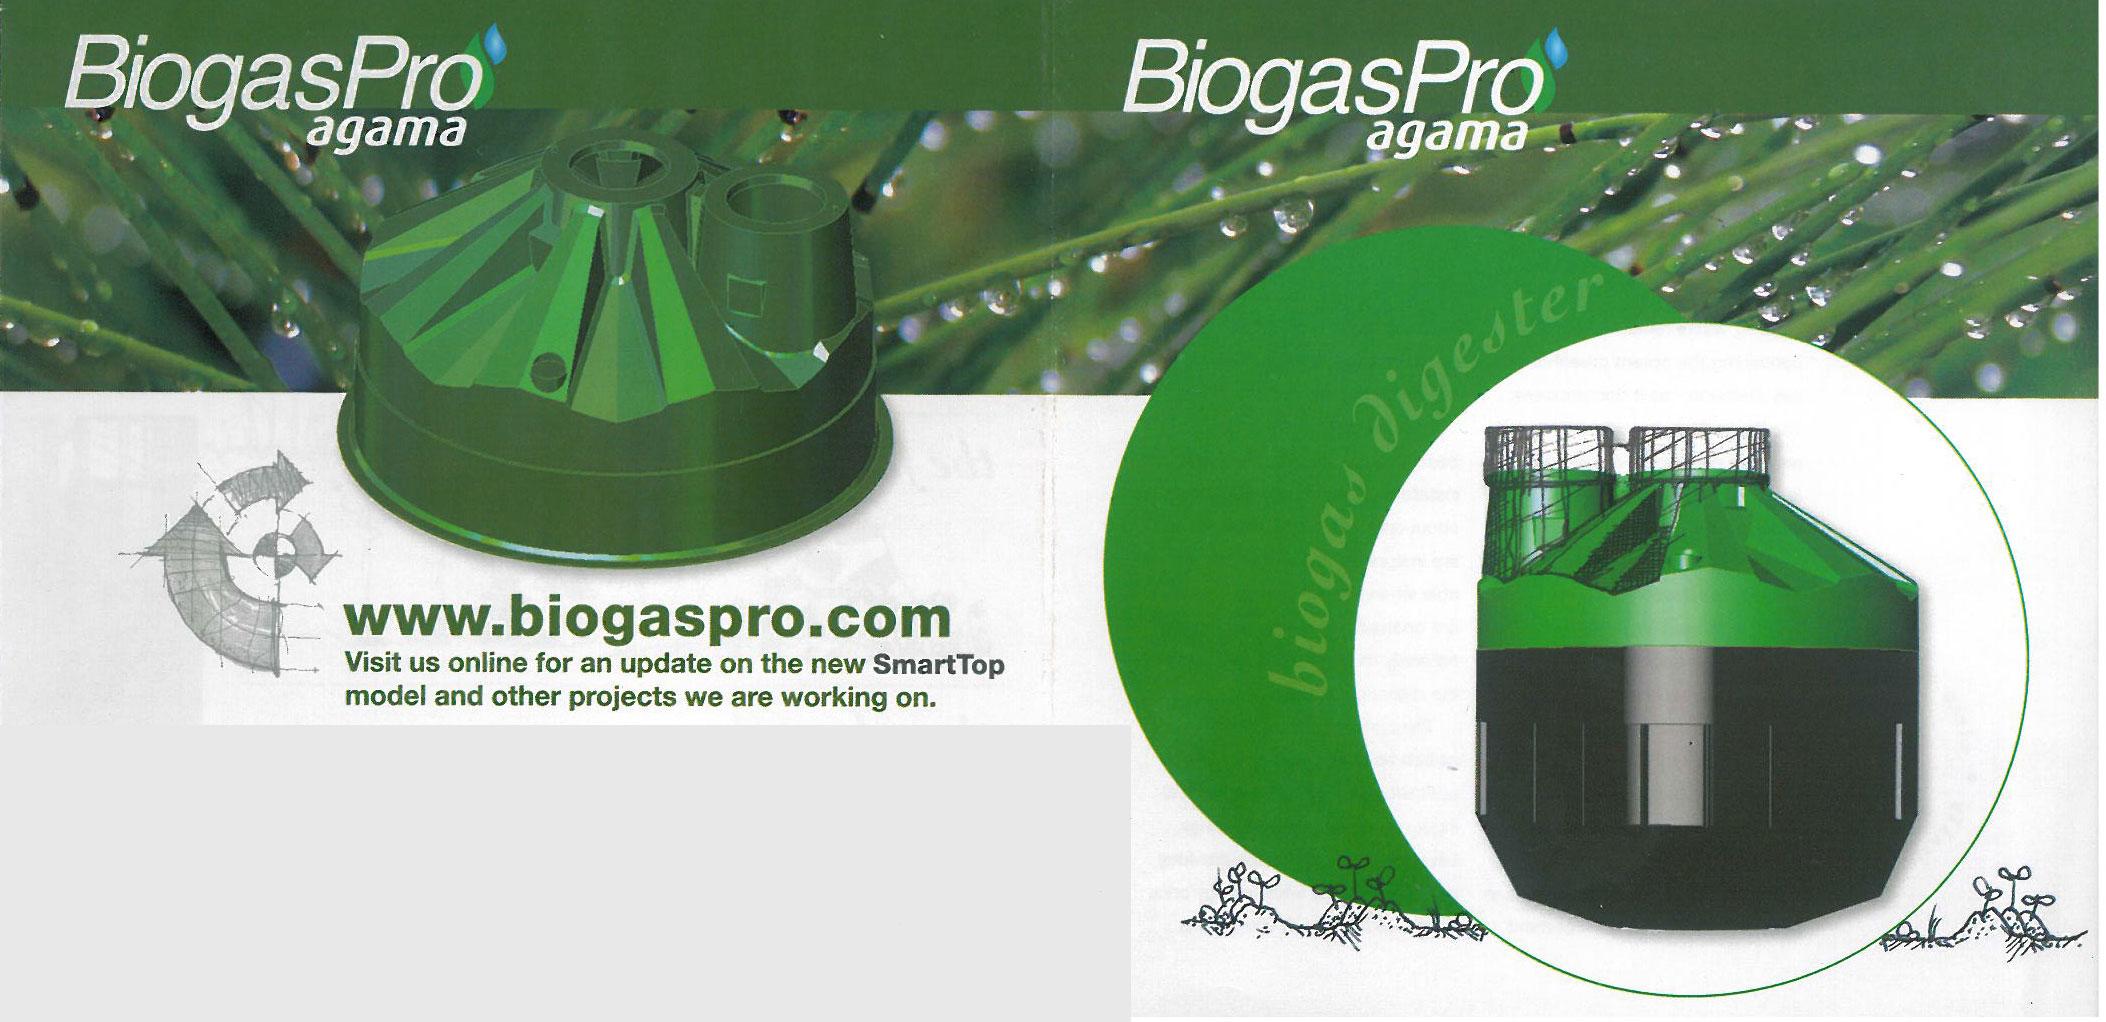 biogas digester Eden Developments www.edendevelopments.co.za